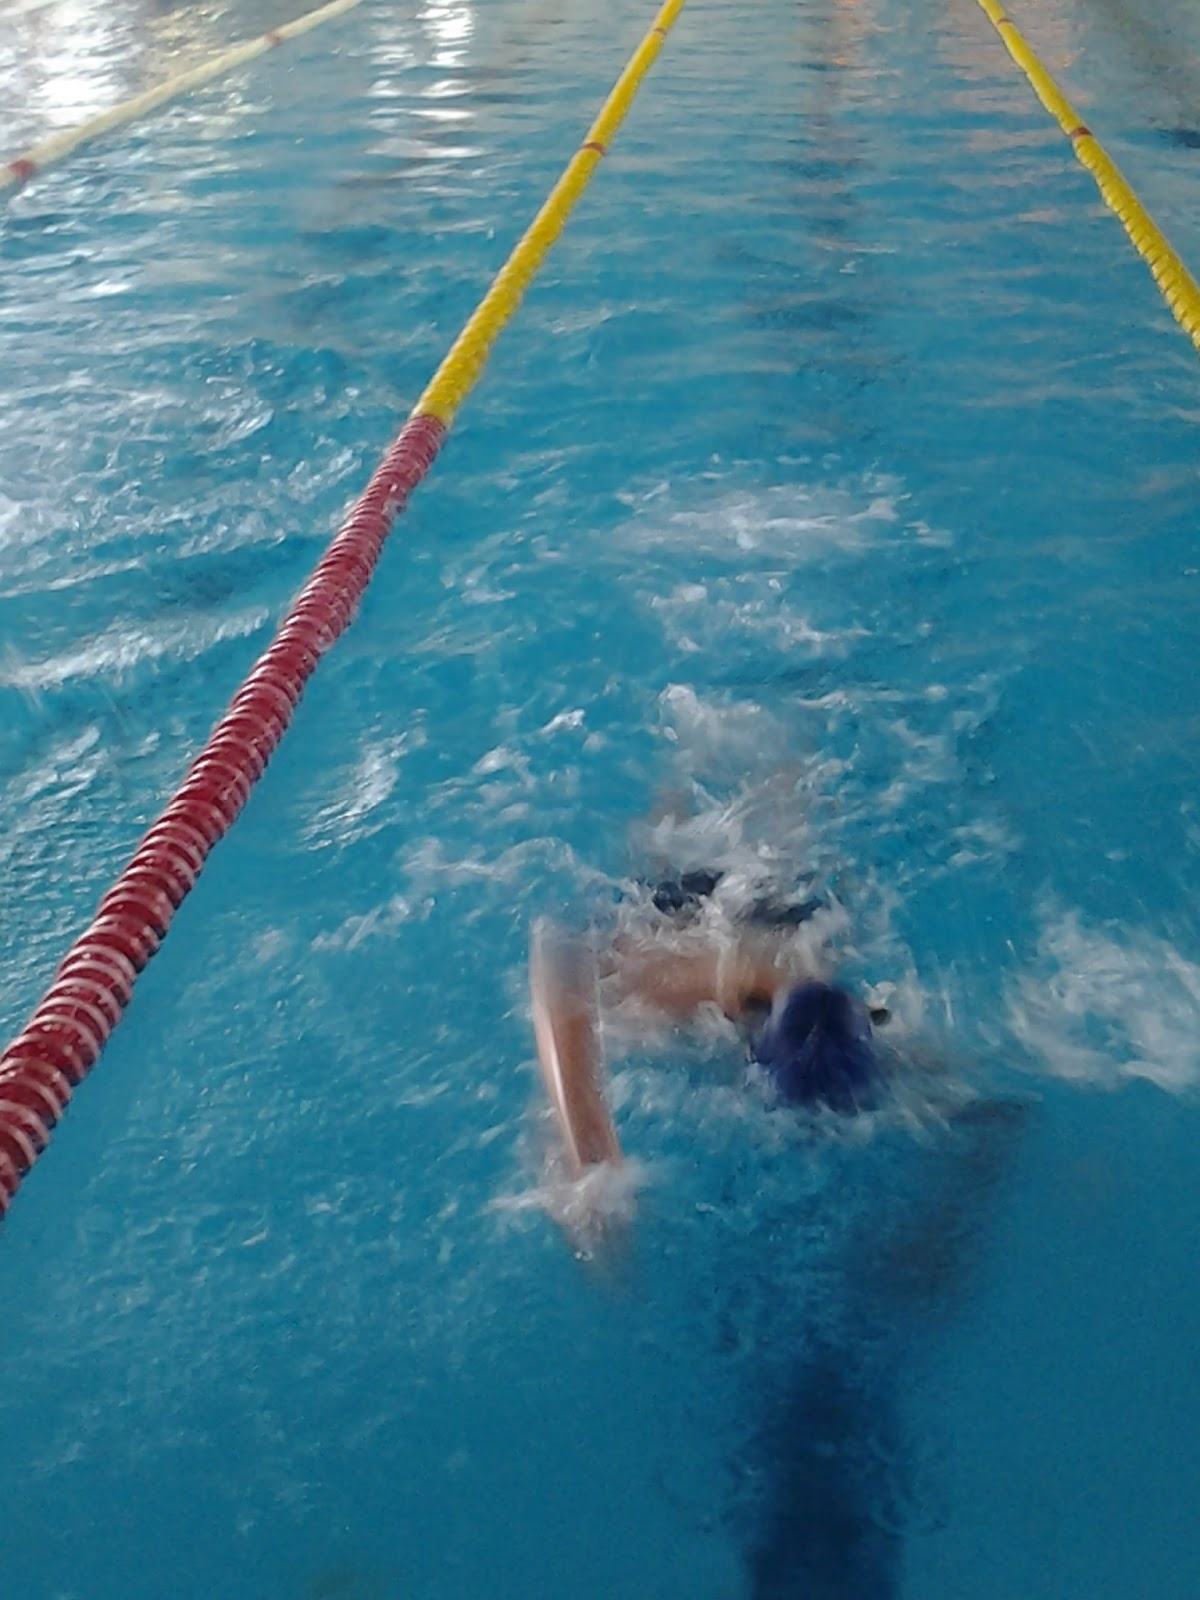 Escuela de natacion piscis 2013 for Piscina climatizada navalmoral